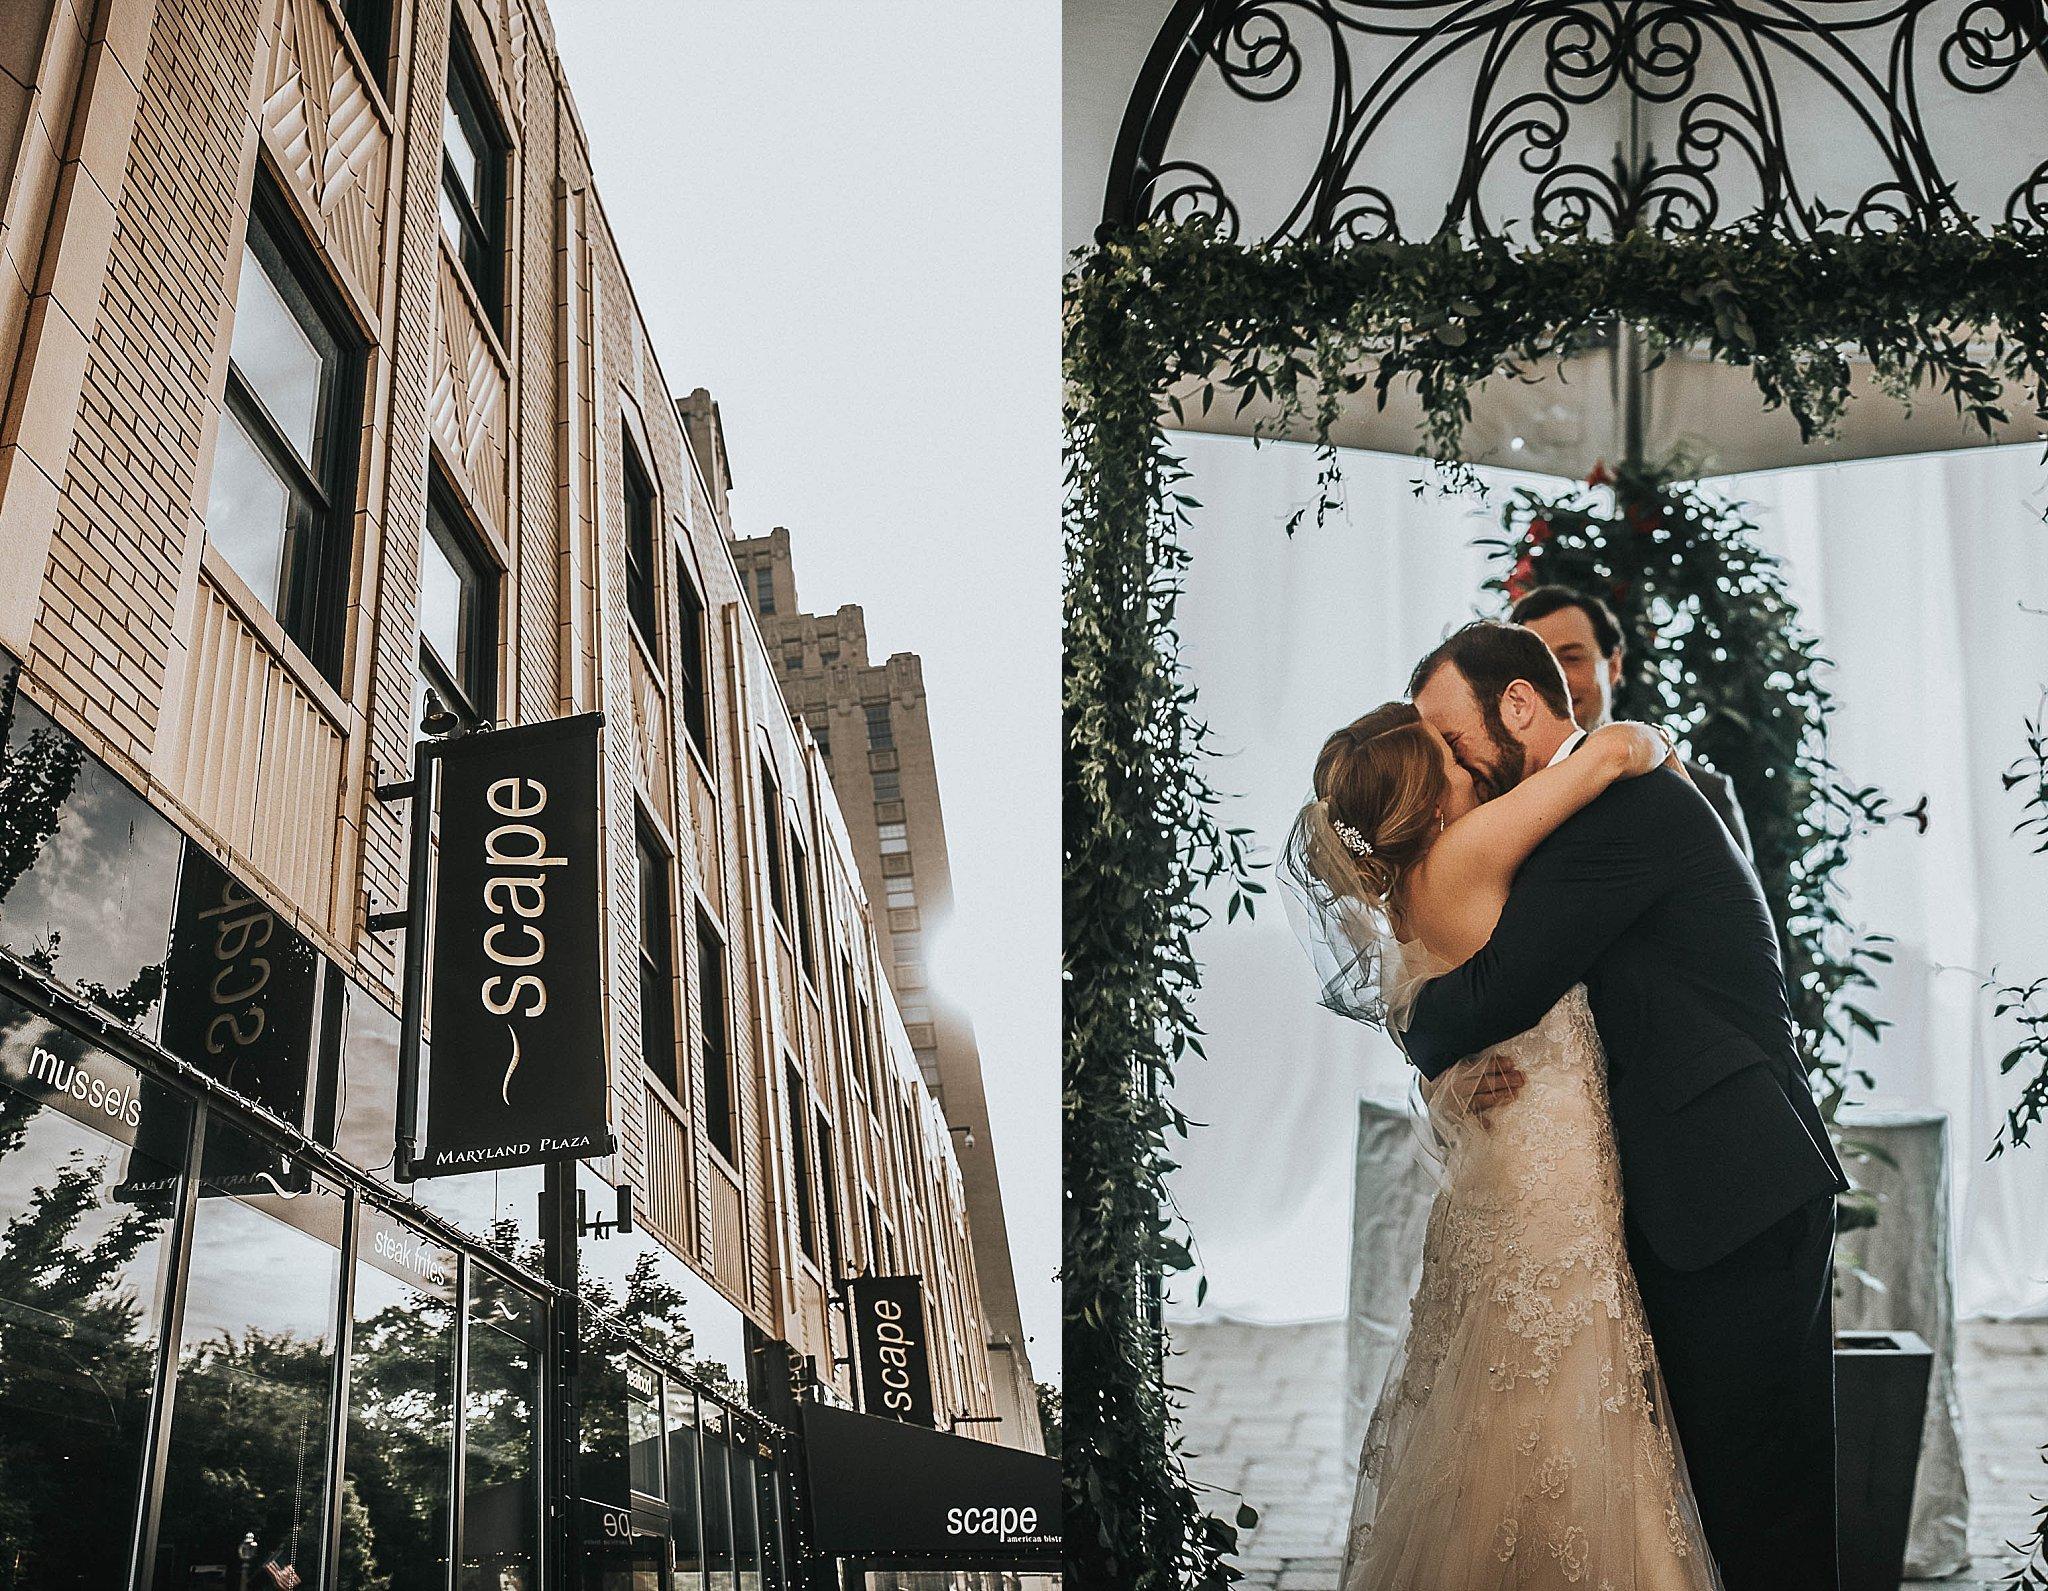 Scape St. Louis Weddings